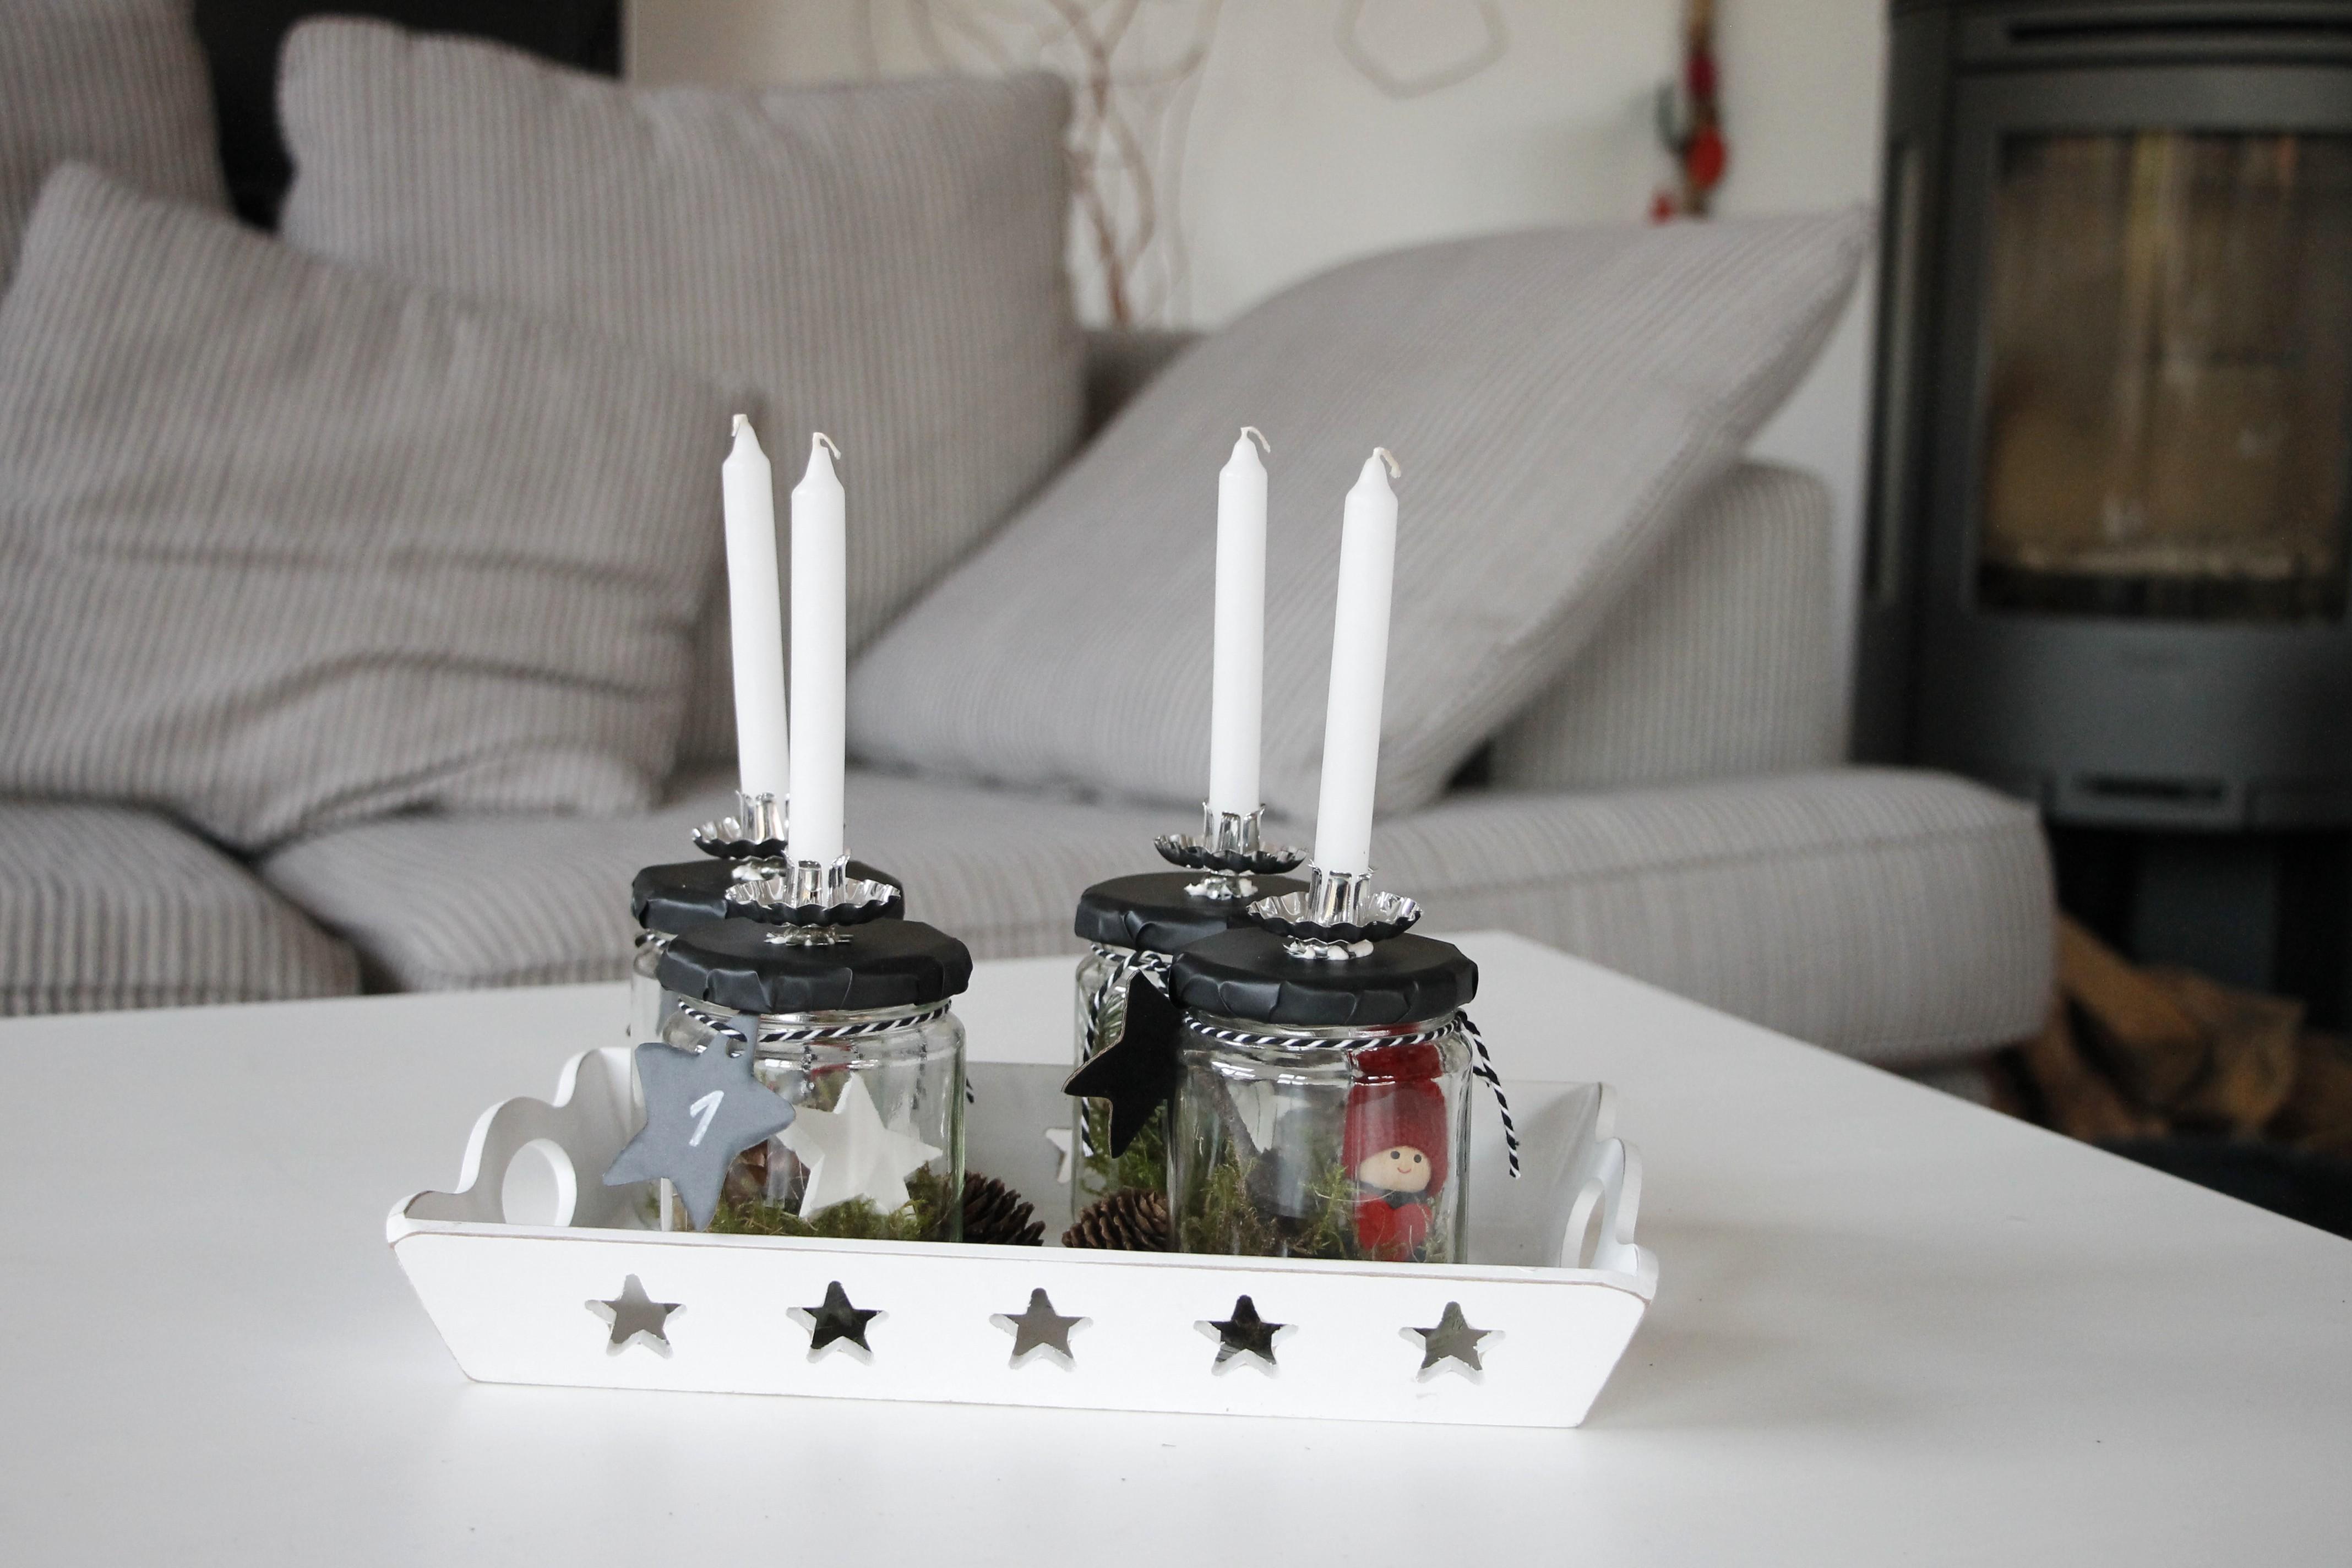 adventskranz mit wei en kerzen otto shopping festival. Black Bedroom Furniture Sets. Home Design Ideas